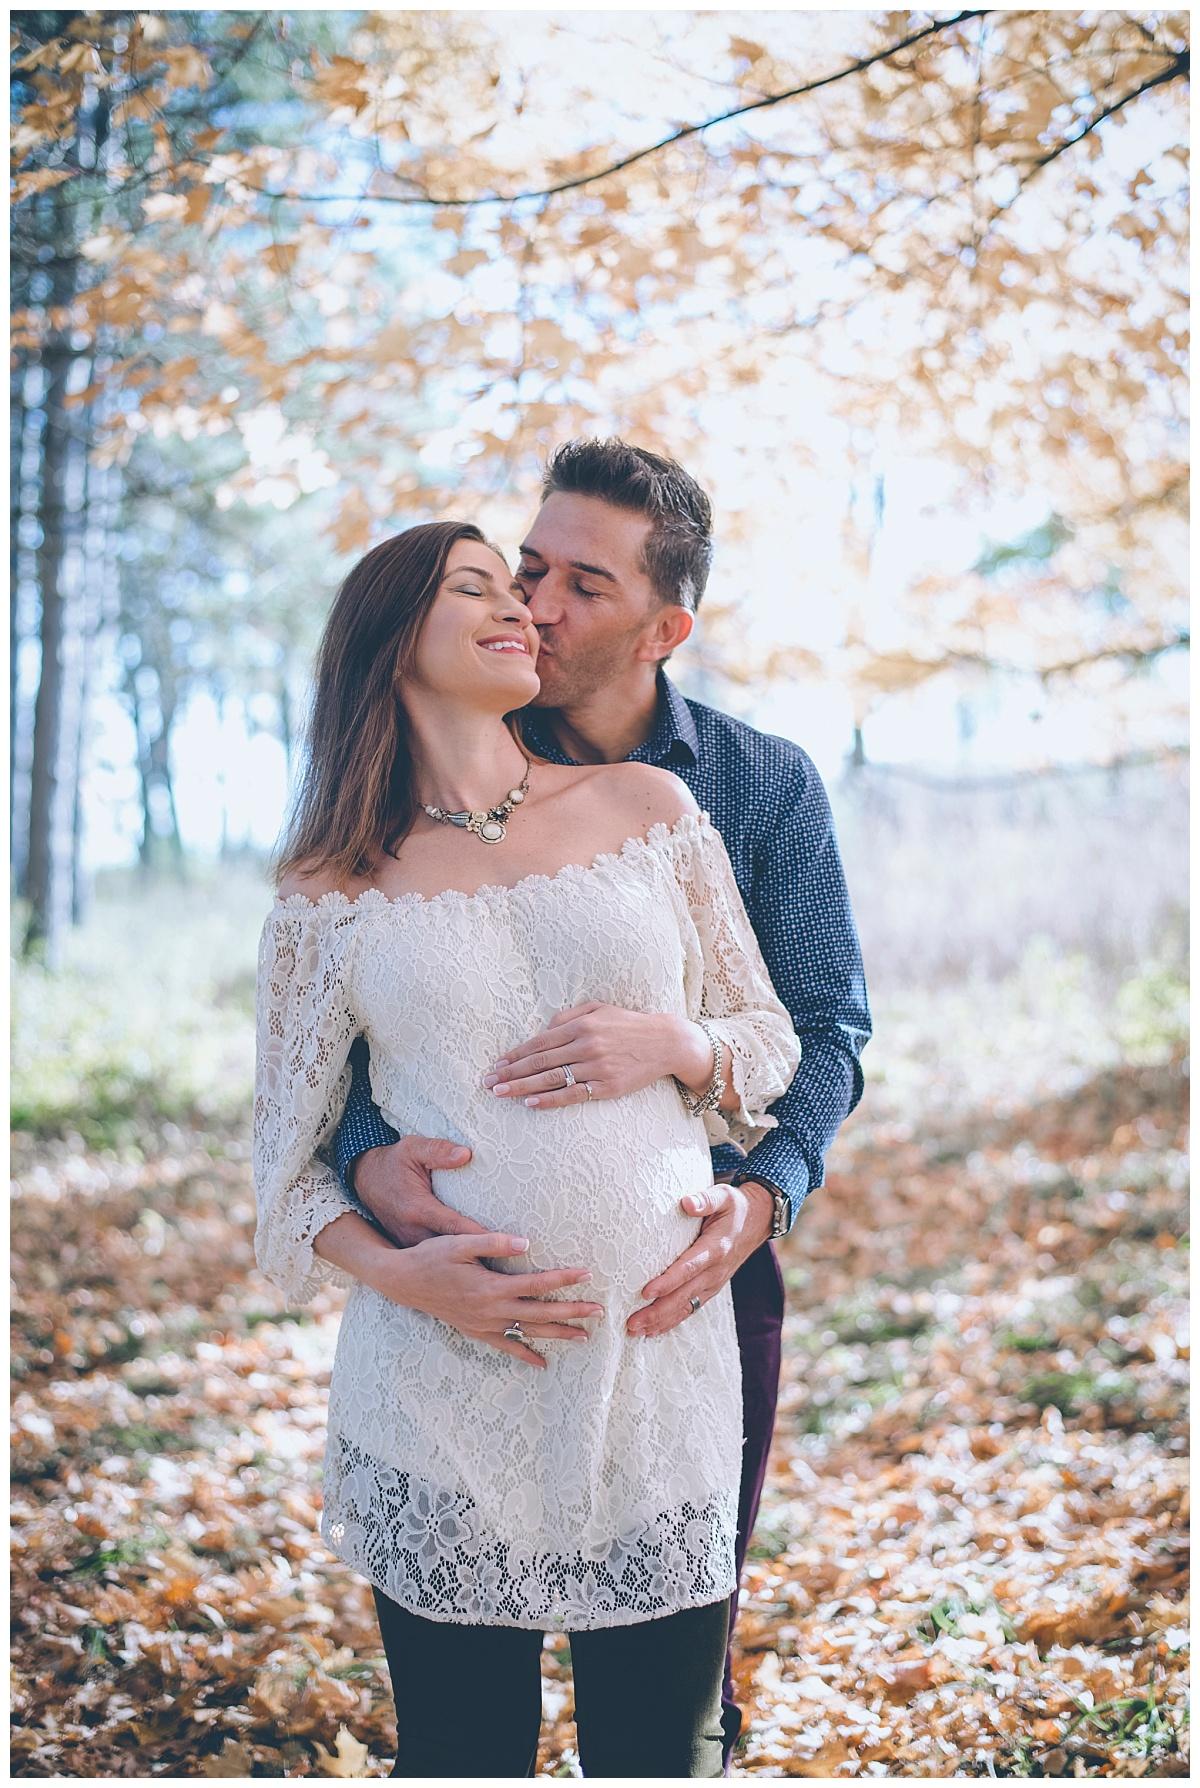 Milwaukee_Maternity_Photographer-8.jpg